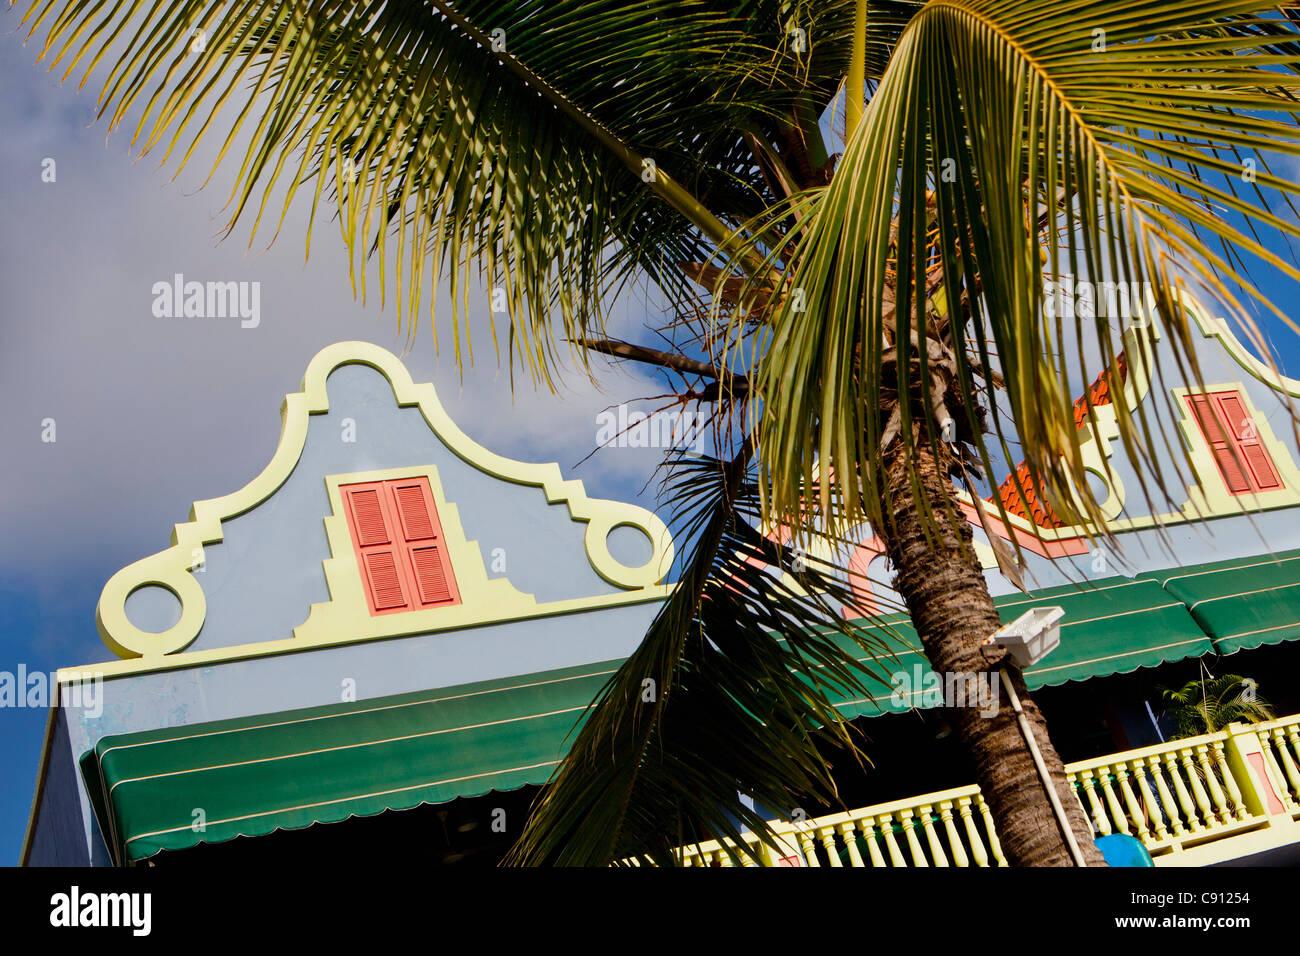 I Paesi Bassi, Bonaire Island, olandese dei Caraibi, Kralendijk, vecchio stile olandese di architettura. Immagini Stock